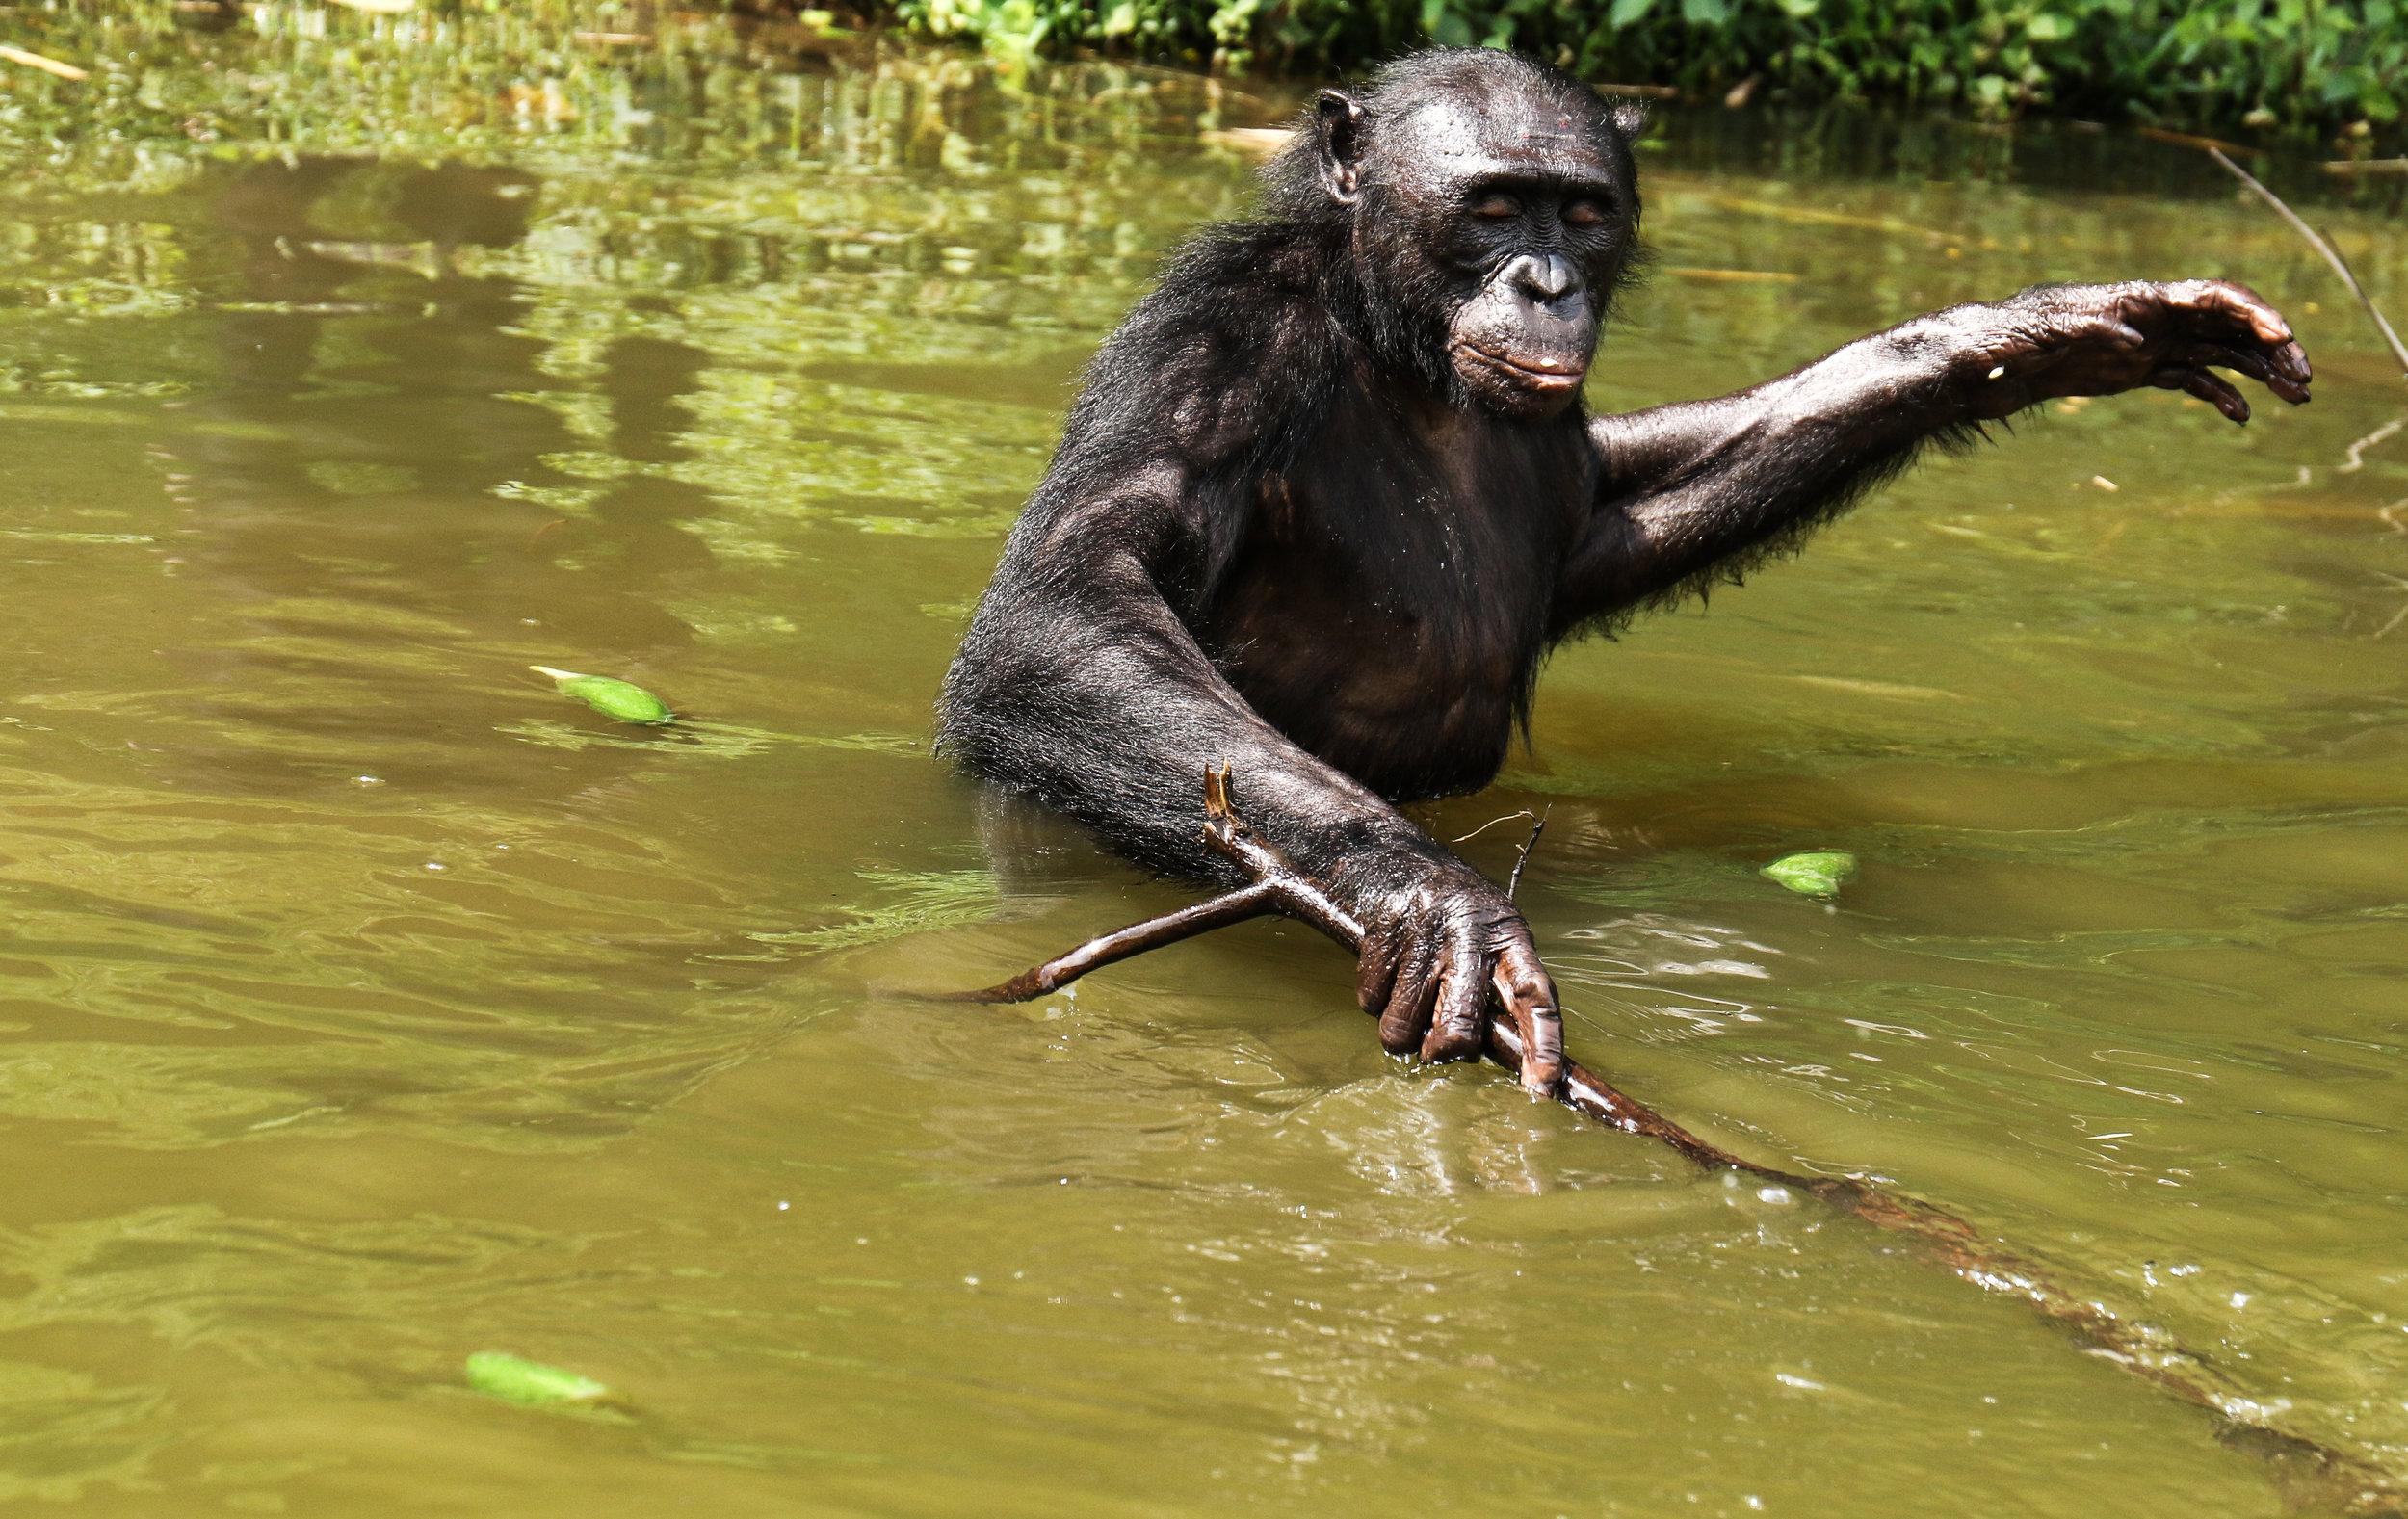 A bonobo wades through the water in Lola ya Bonobo sanctuary outside Kinshasa, DRC